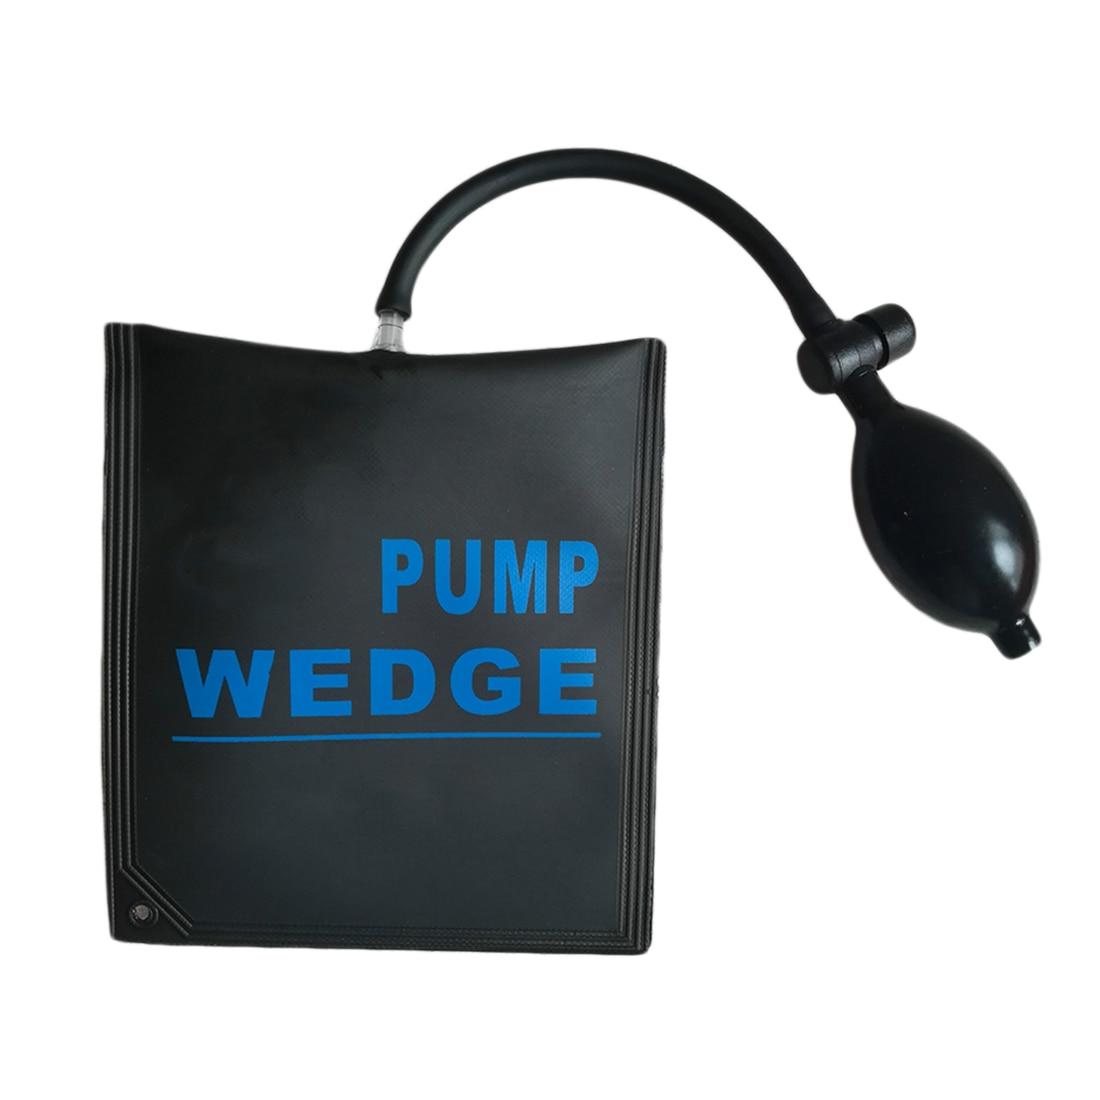 Locksmith Supplies Pump Air Wedge Pump Up Bag Car Door Window Frame Fitting Install Shim Wedge Tools Set 2pcs 15 x 17cm